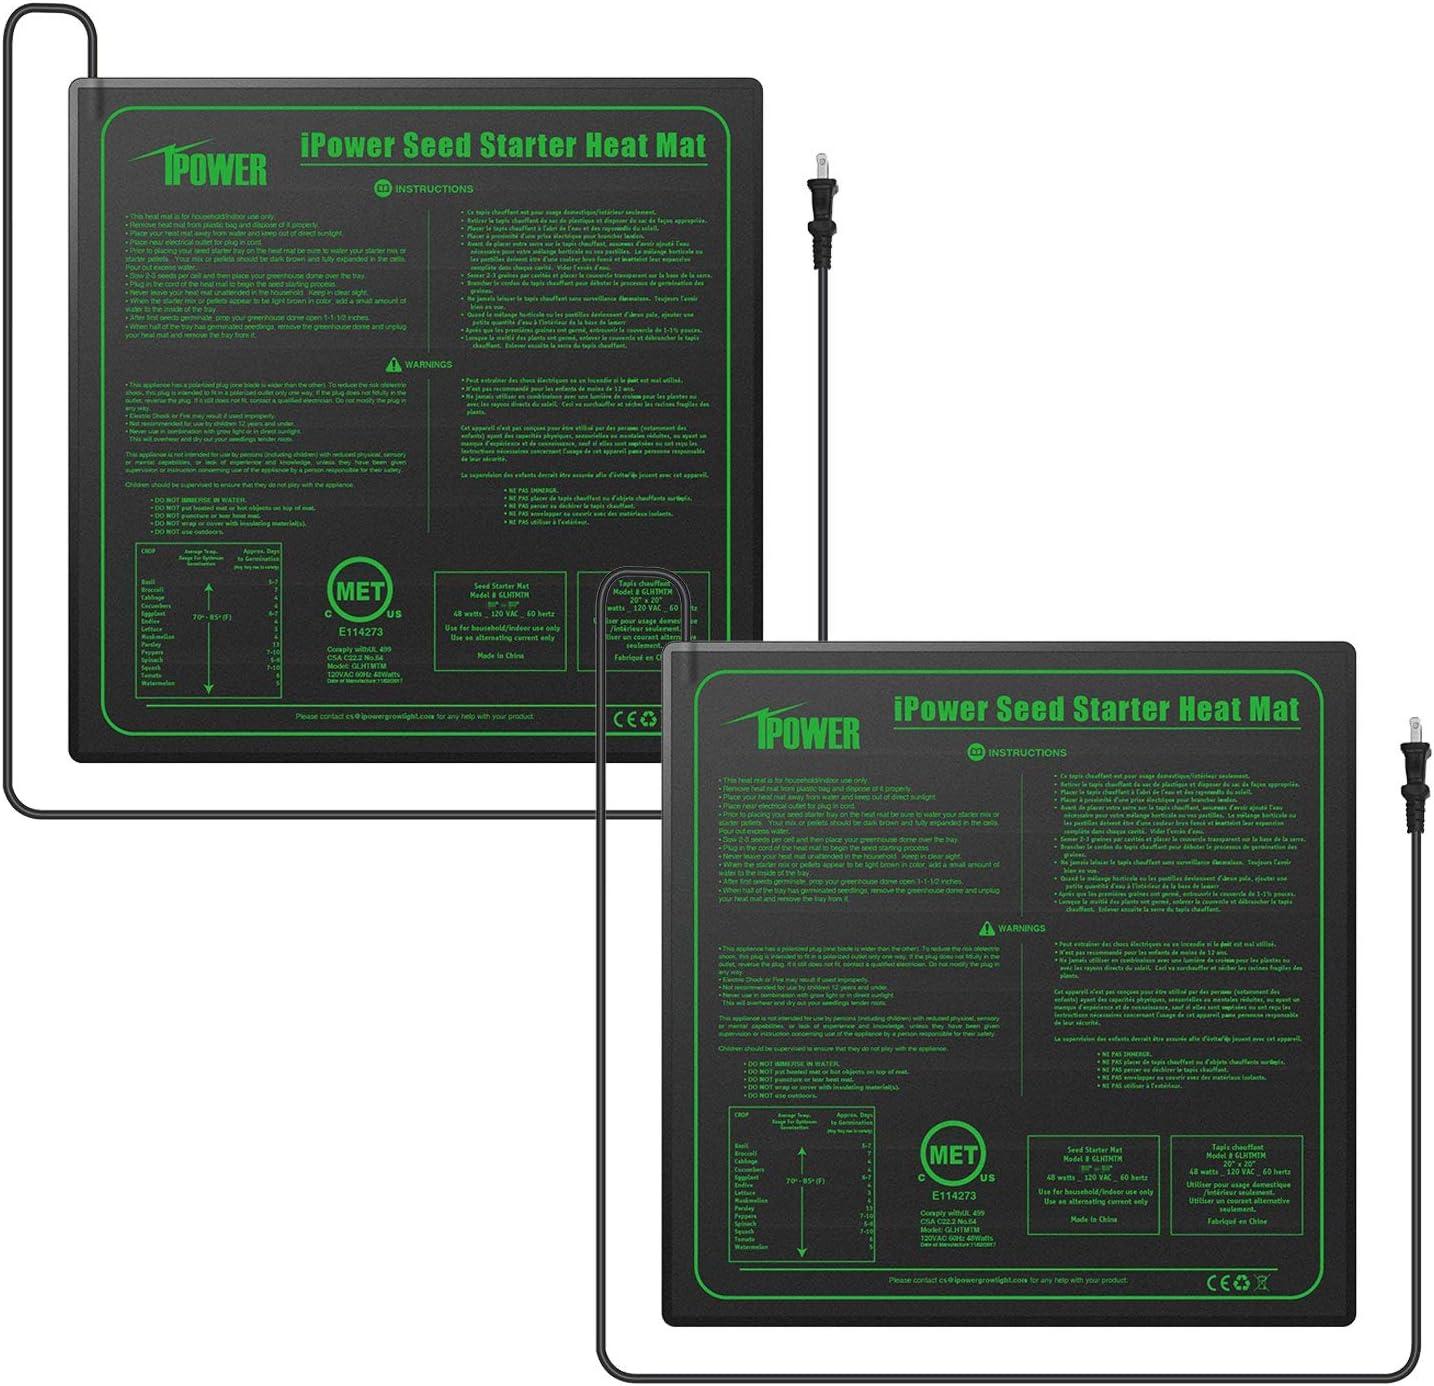 iPower GLHTMTMX2 2-Pack Durable Waterproof Seedling Mat 20 x 20 Warm Hydroponic Heating Pad, Black